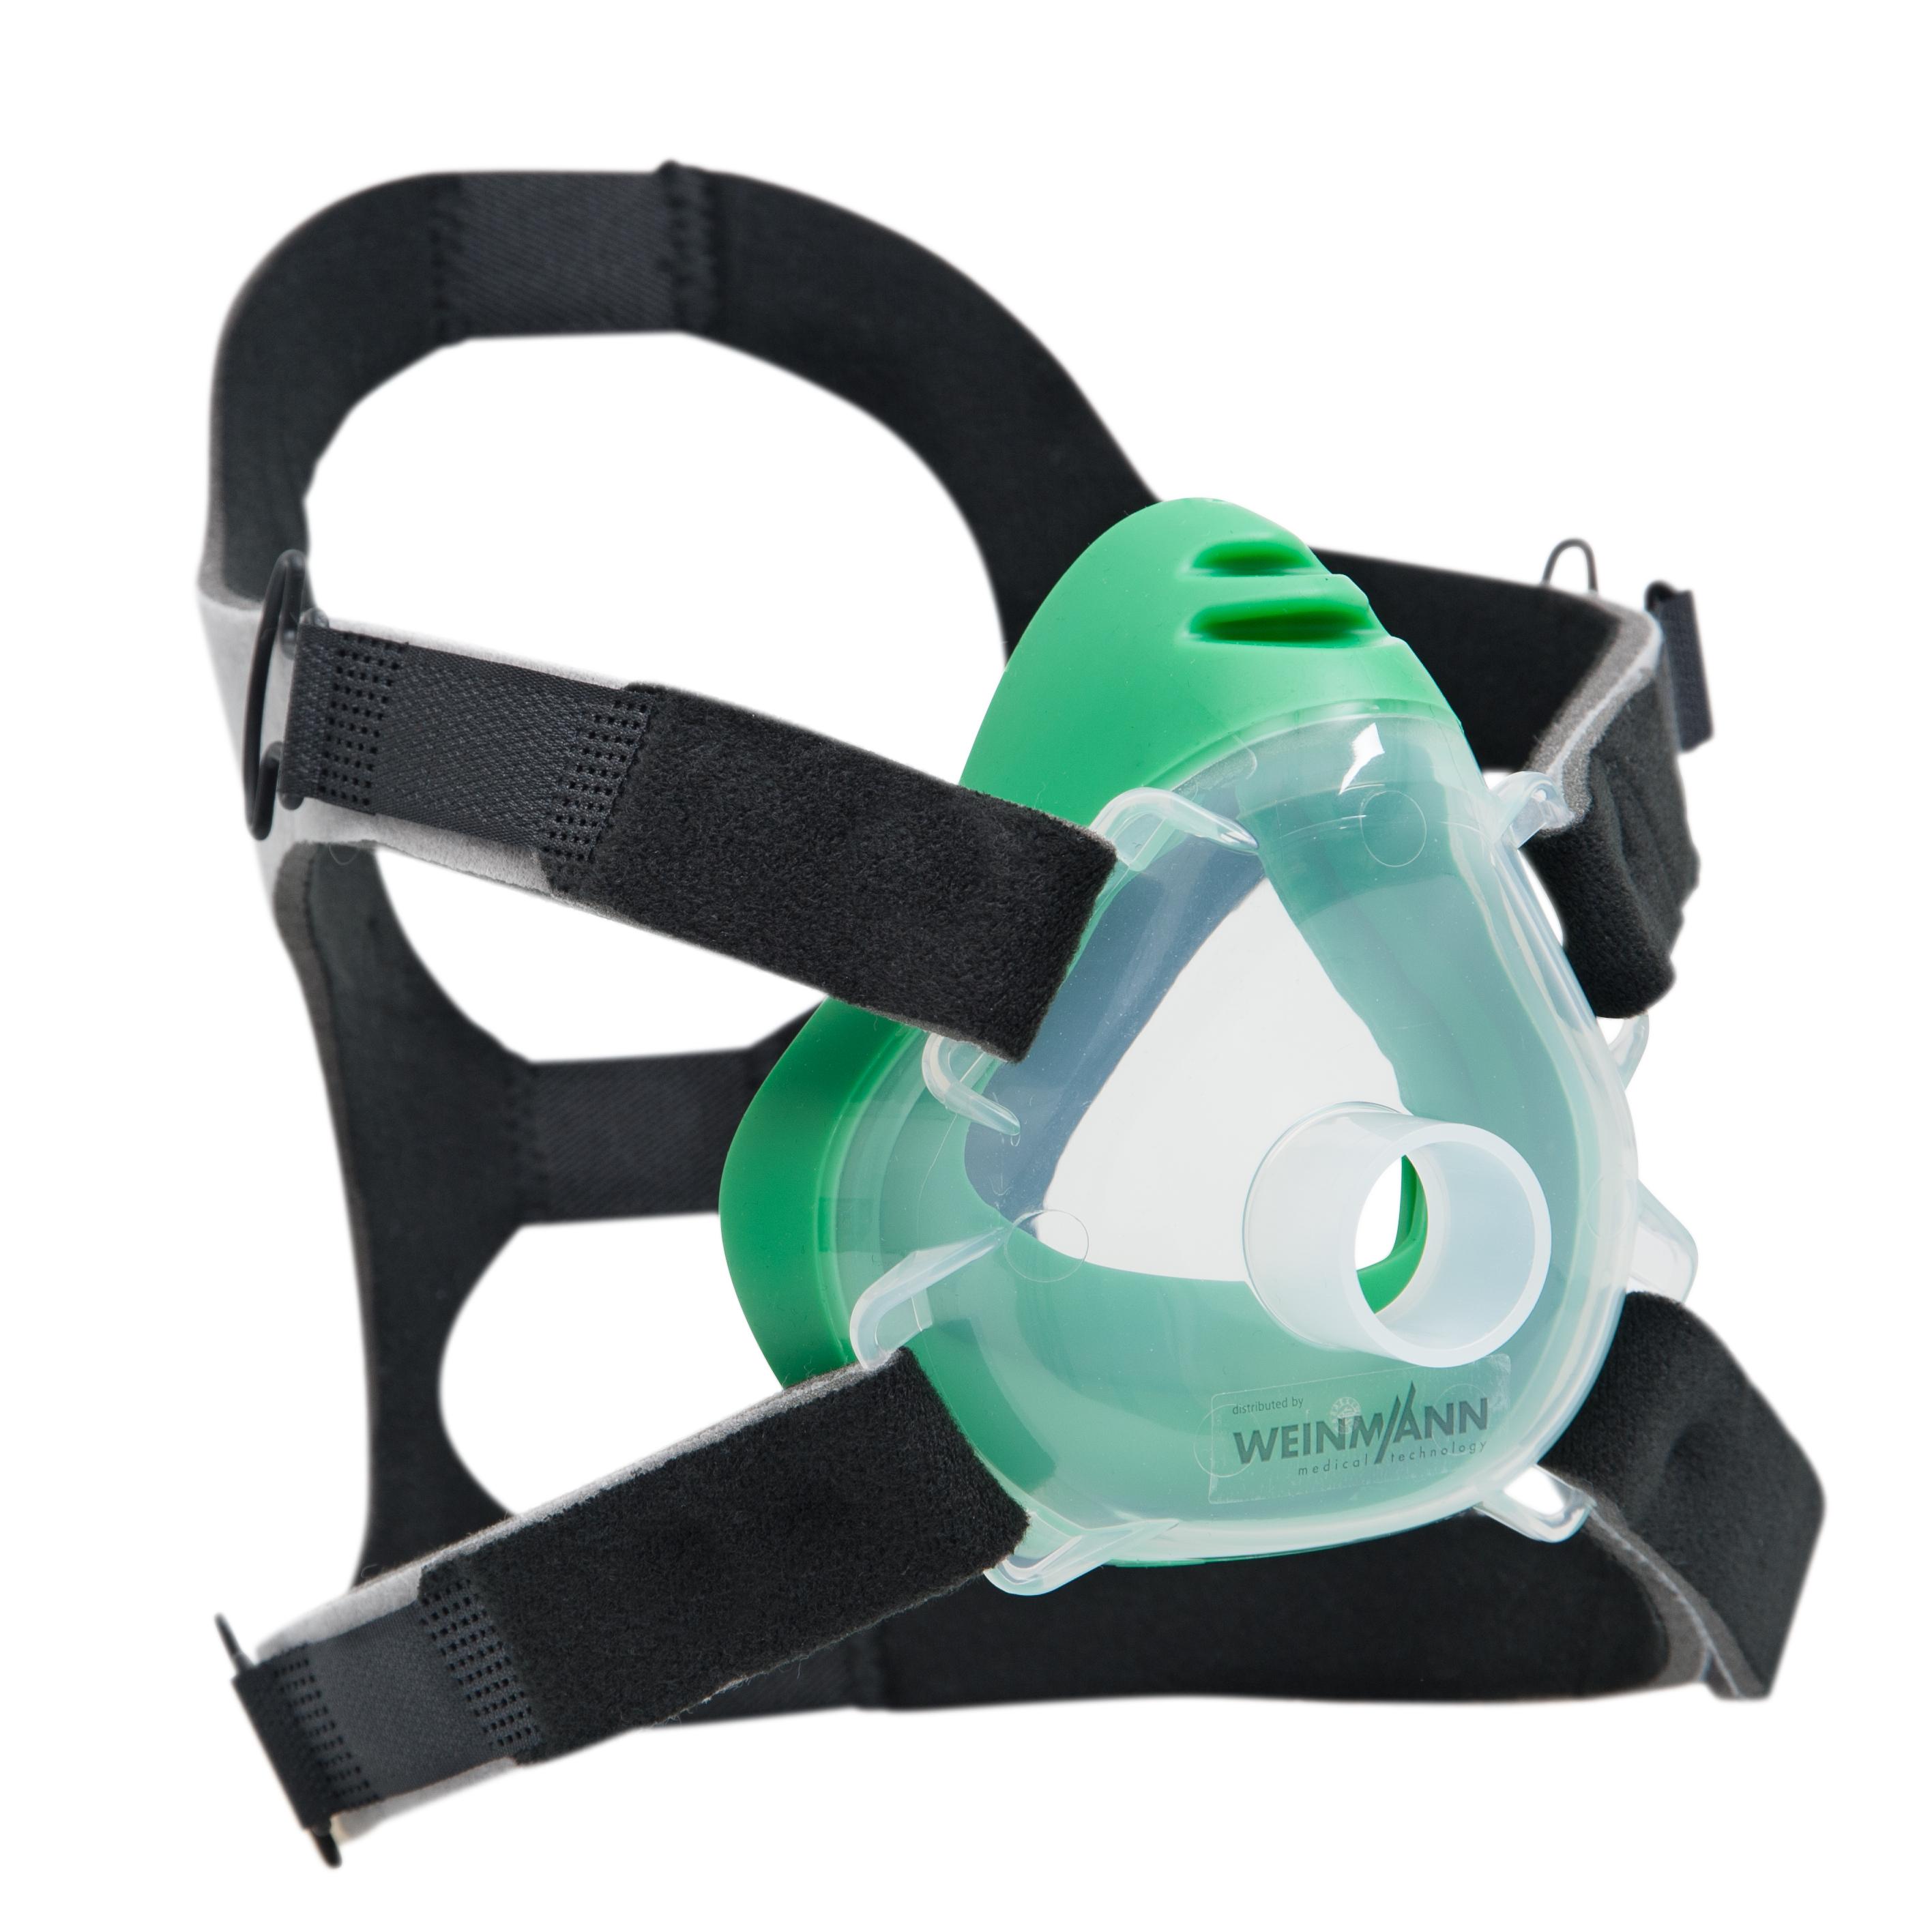 Premium CPAP-/NIV-Einwegmaske inkl. Kopfbänderung  Größe M (Erwachsener), 10er-Set